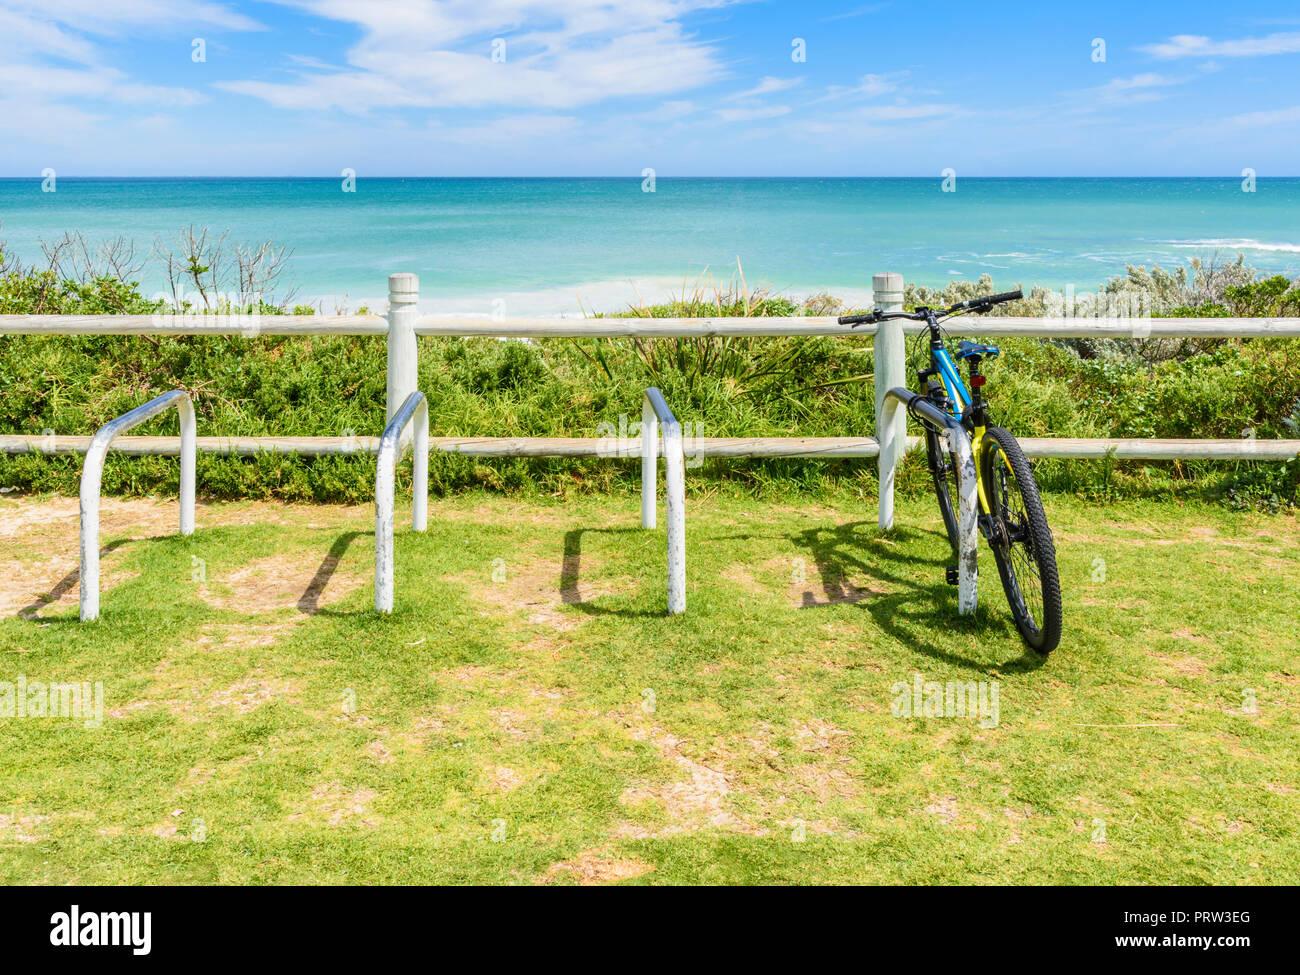 Bike in a cycle rack overlooking Trigg Beach, Trigg, Western Australia Stock Photo